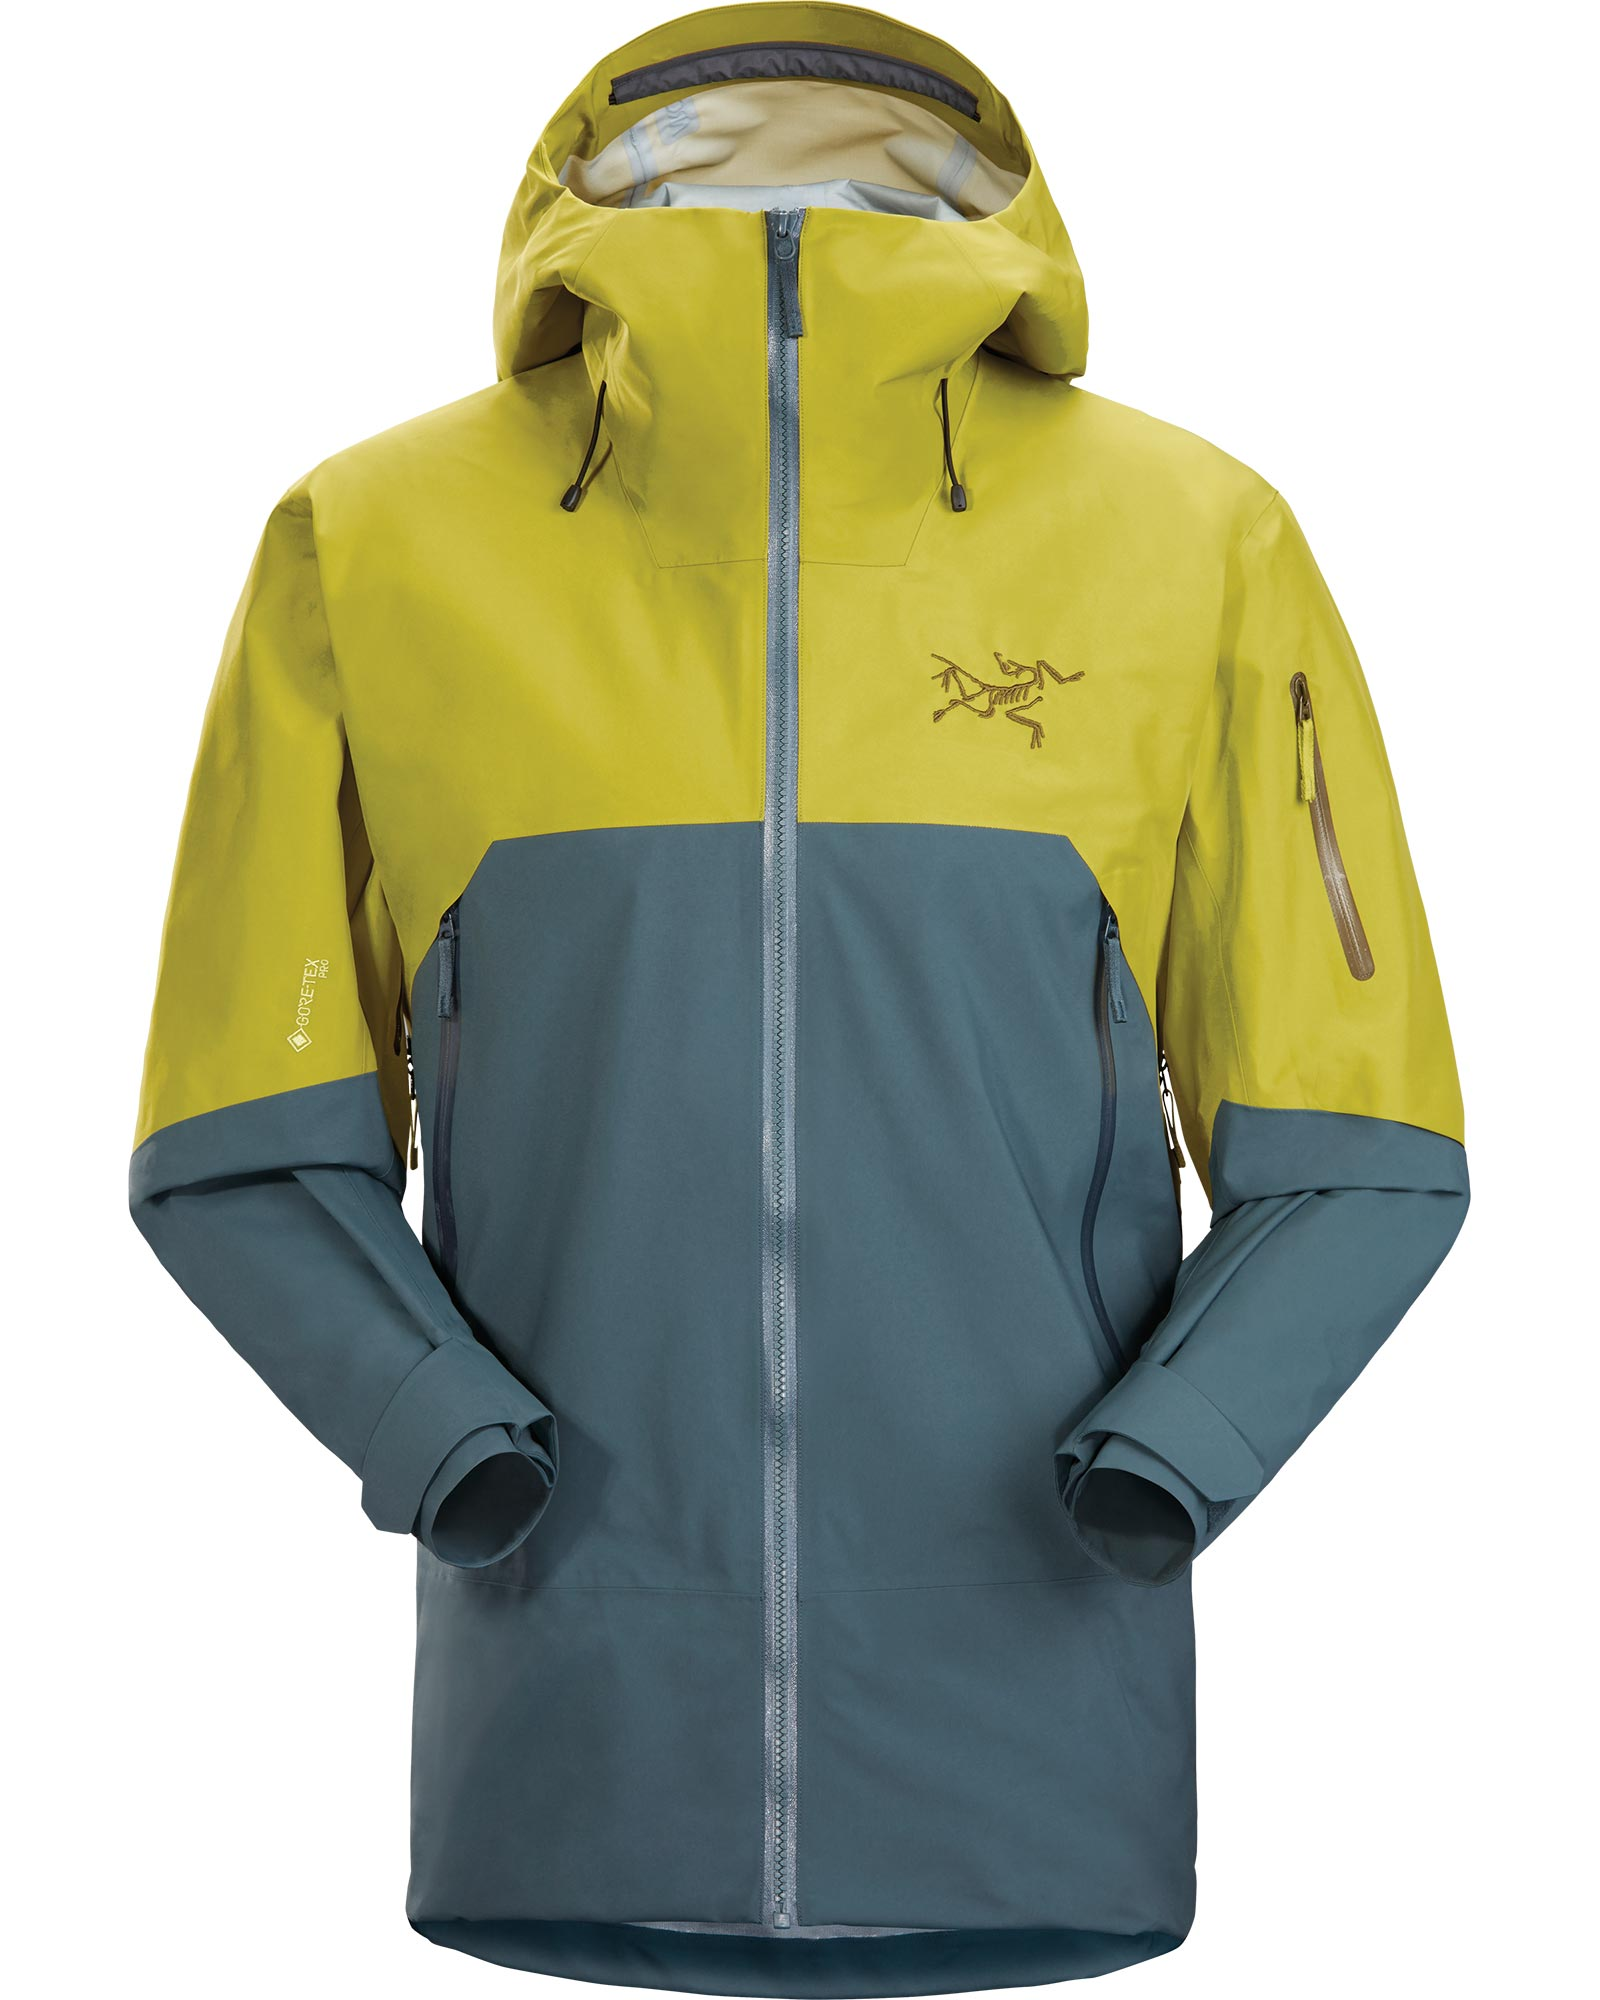 Arc'teryx Men's Rush GORE-TEX Pro Ski Jacket 0